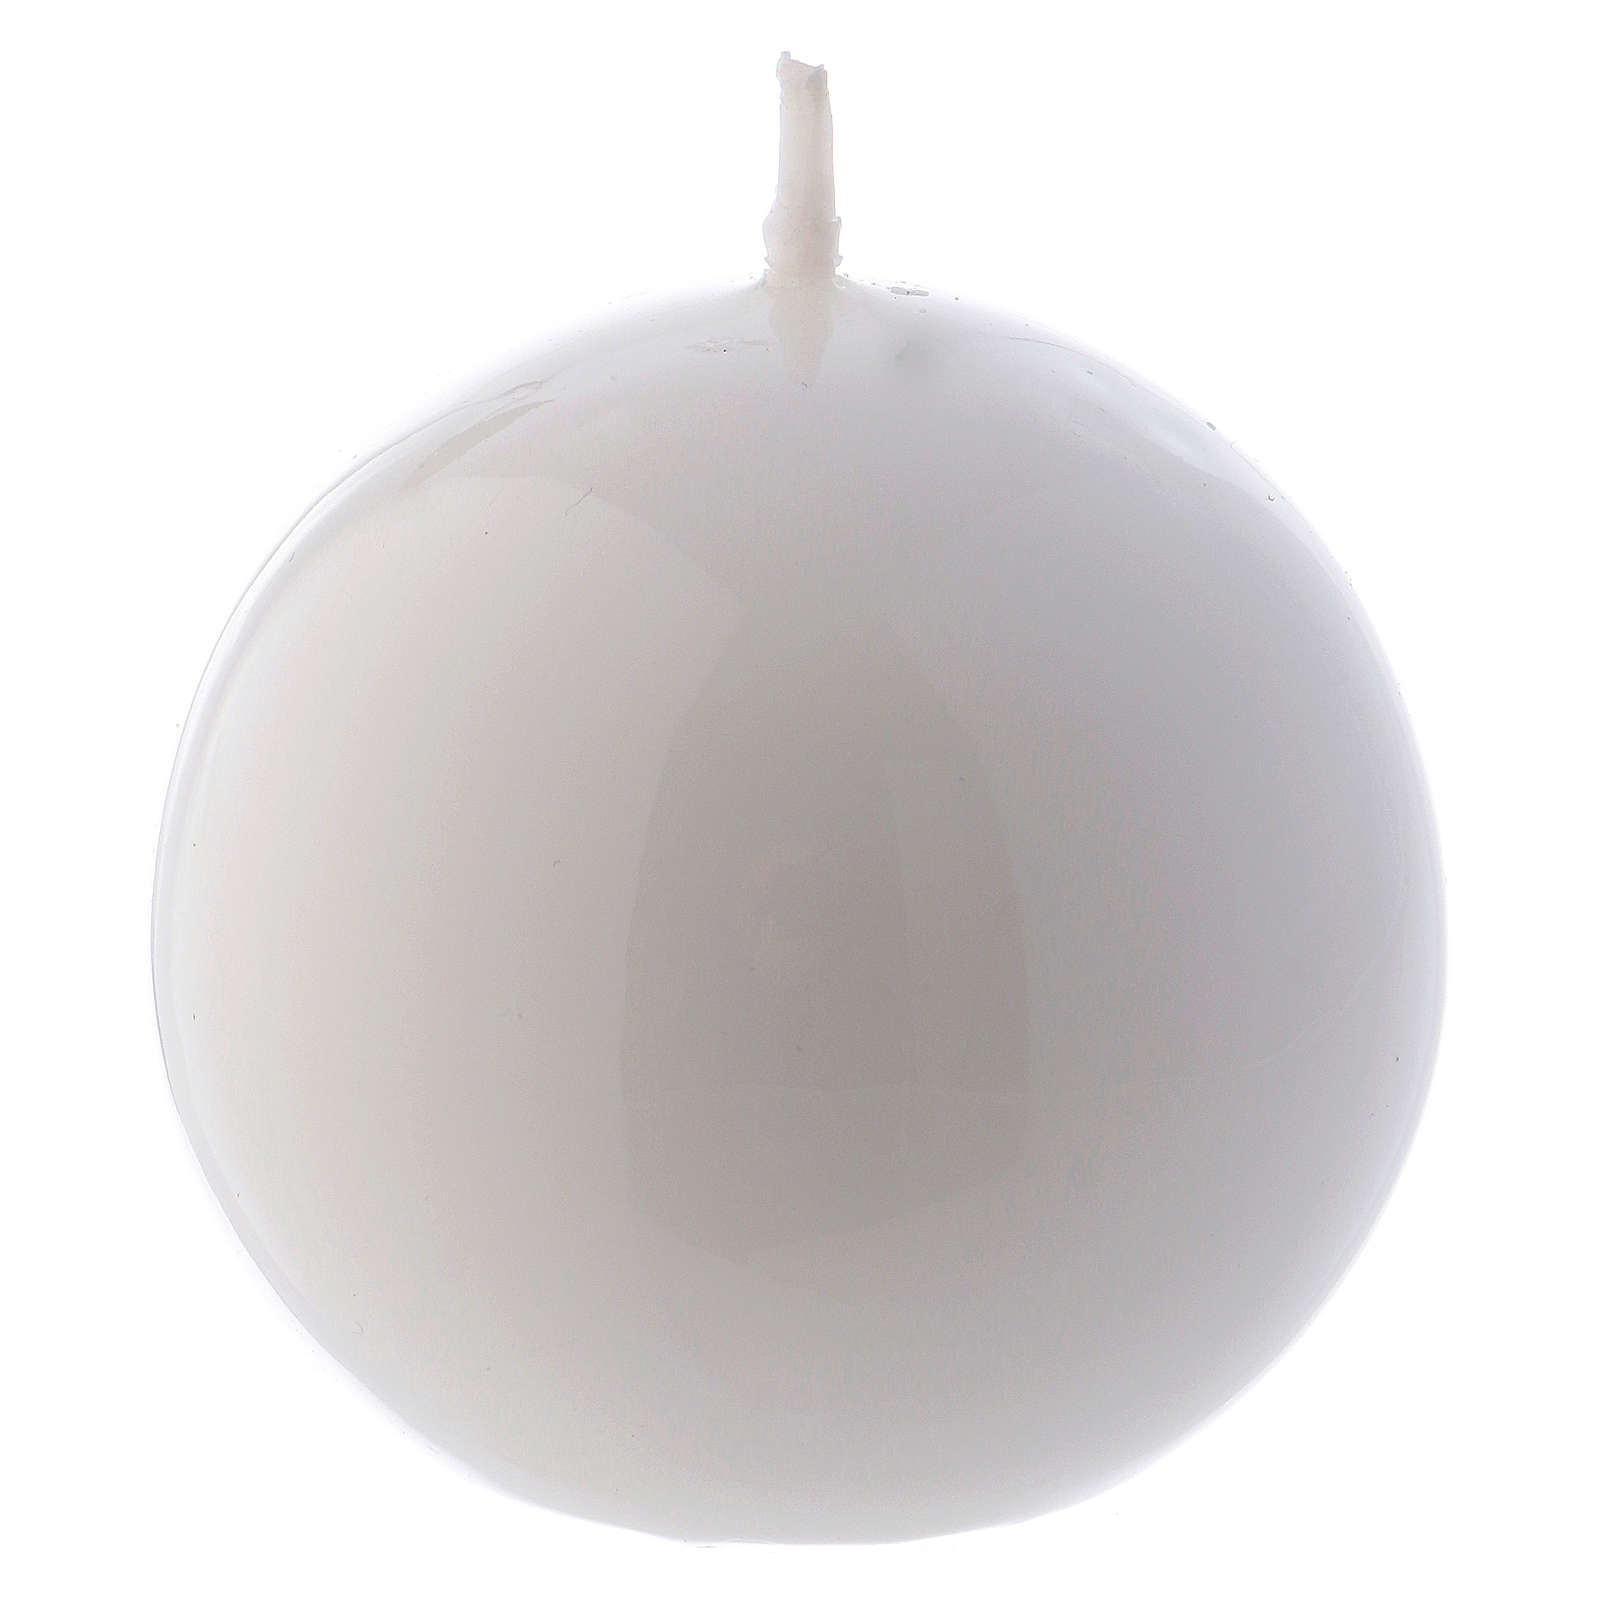 Bougie Sphère Brillante Ceralacca diam. 6 cm blanc 3